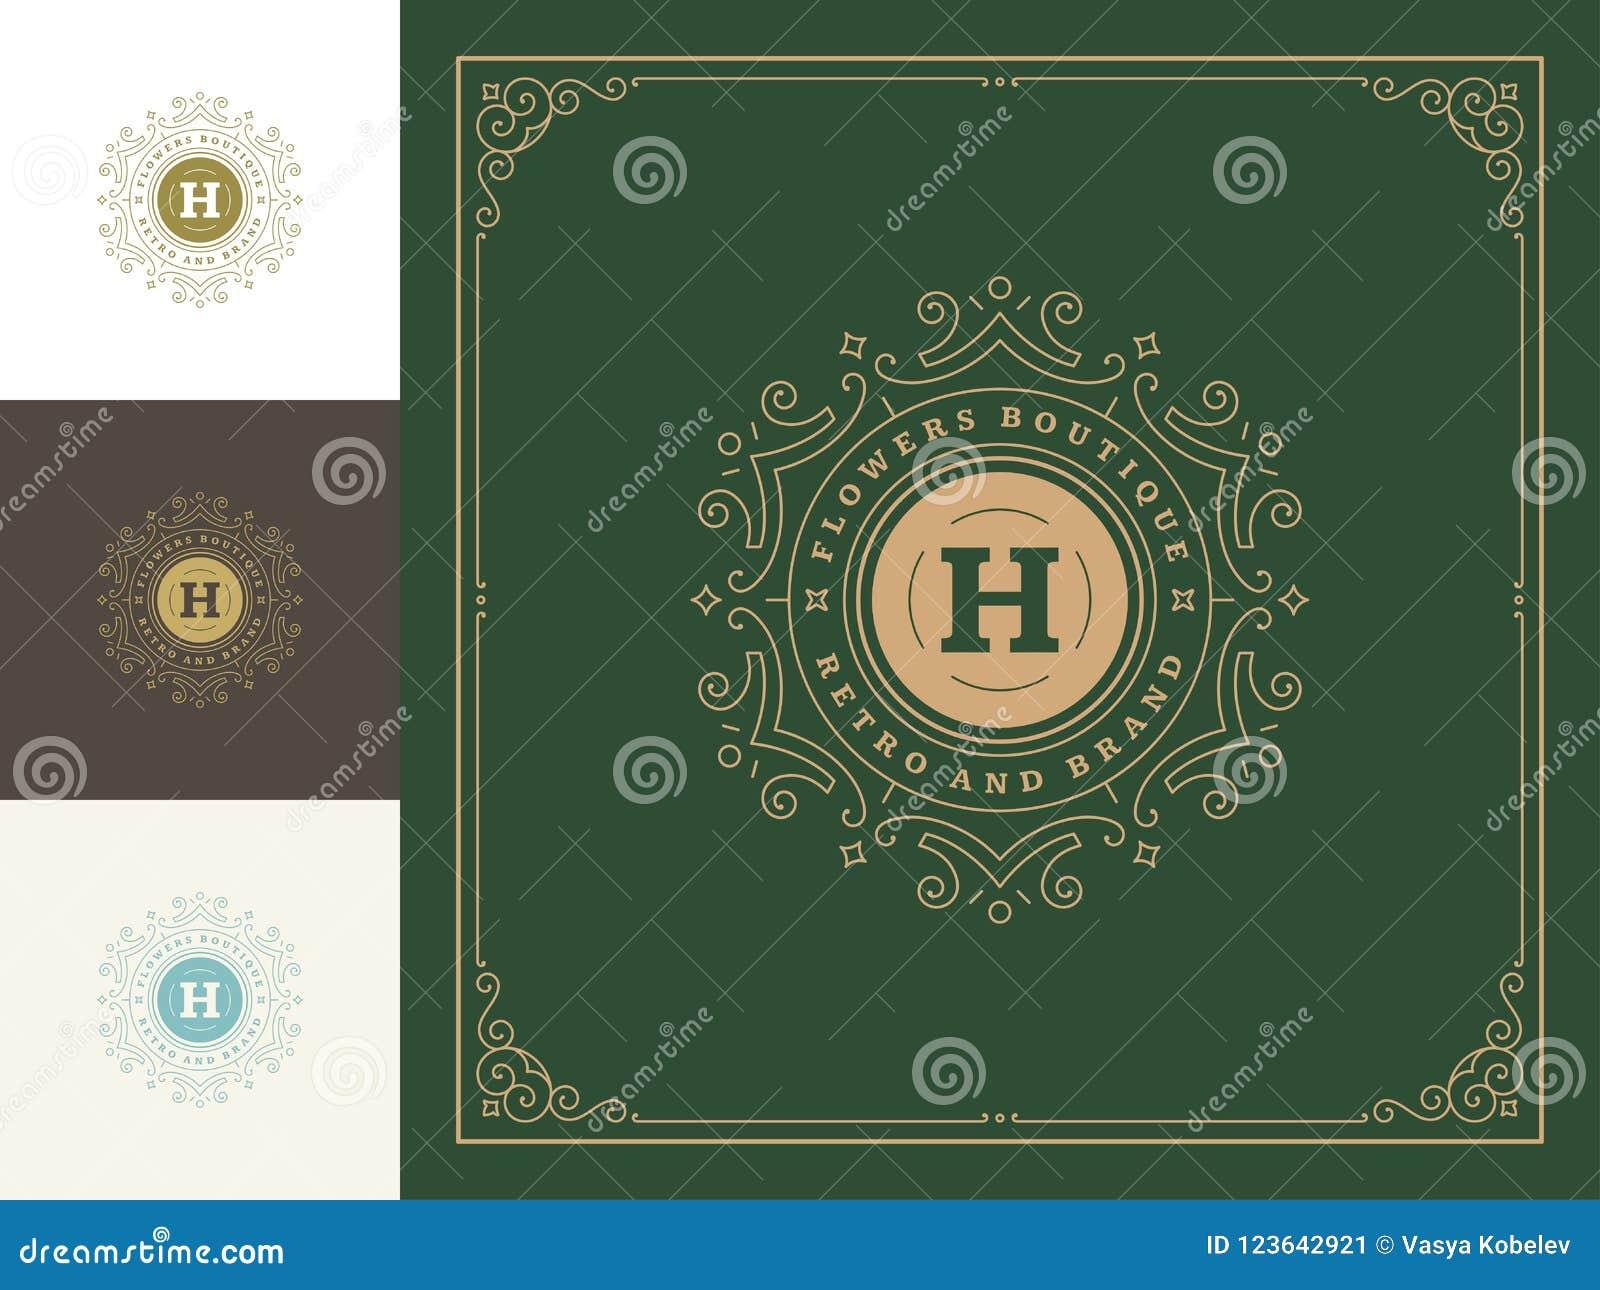 Luxury logo template vector vintage flourishes ornaments.